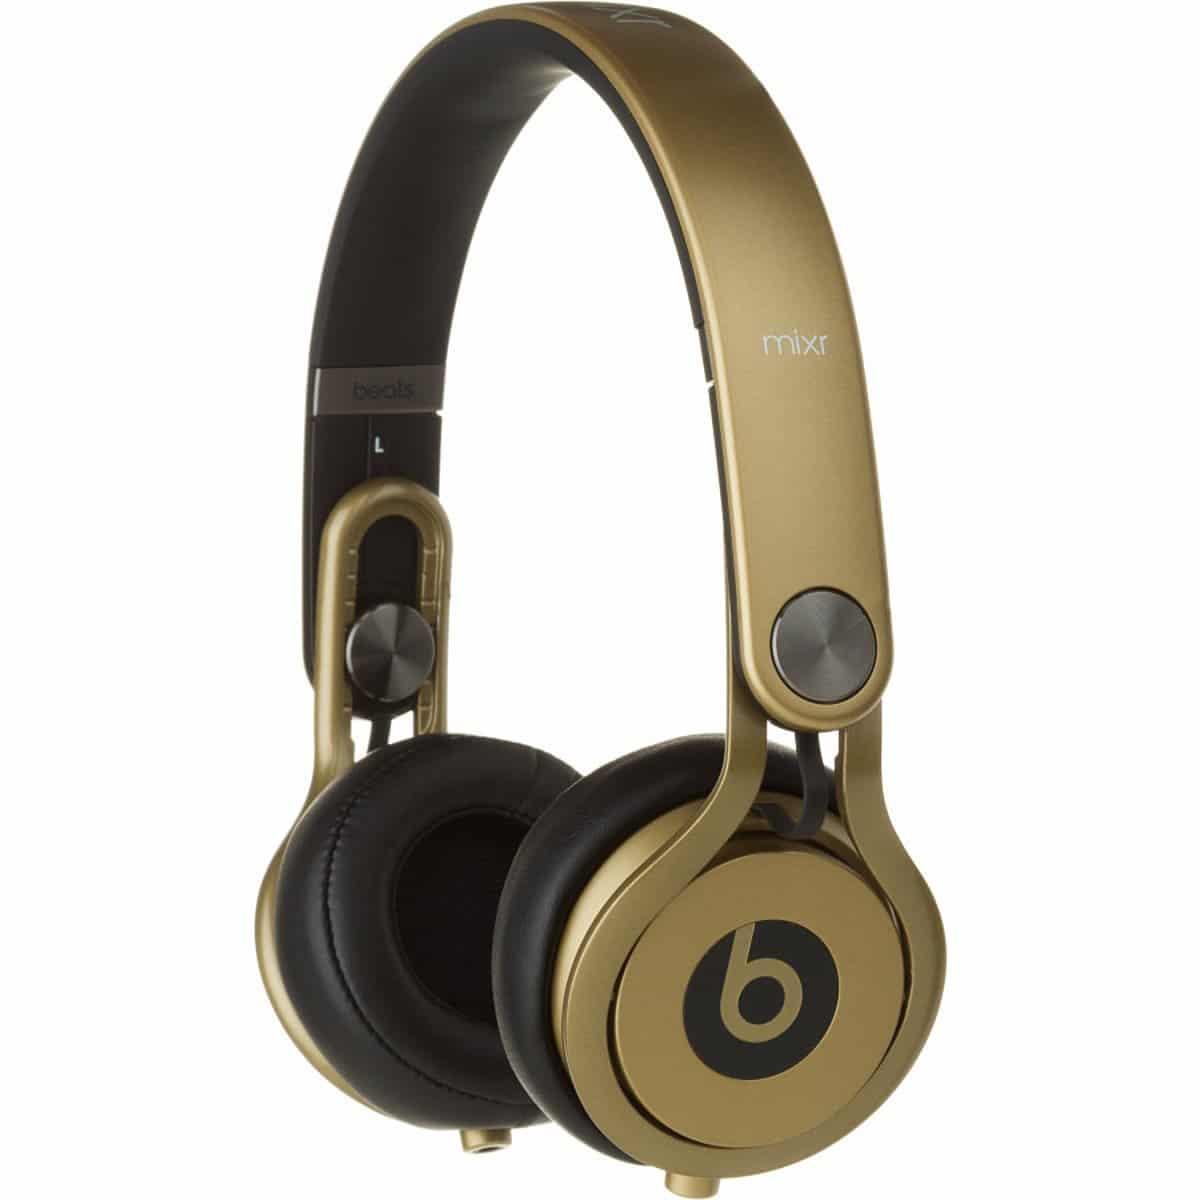 bose gold headphones. bose soundlink headphones gold b